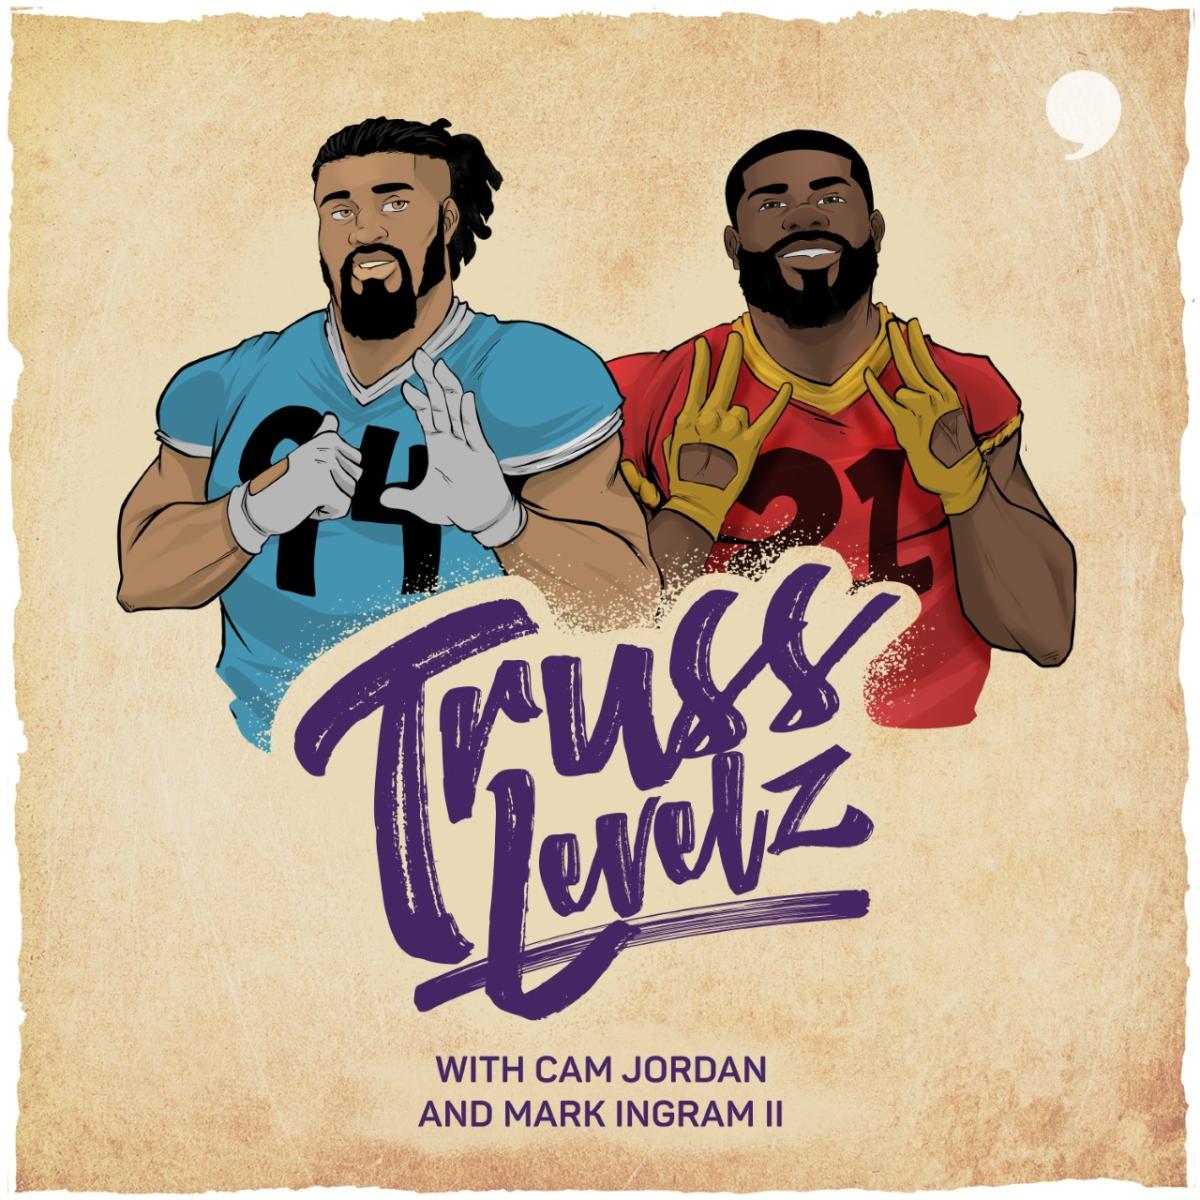 Truss Levelz Podcast with Cam Jordan and Mark Ingram